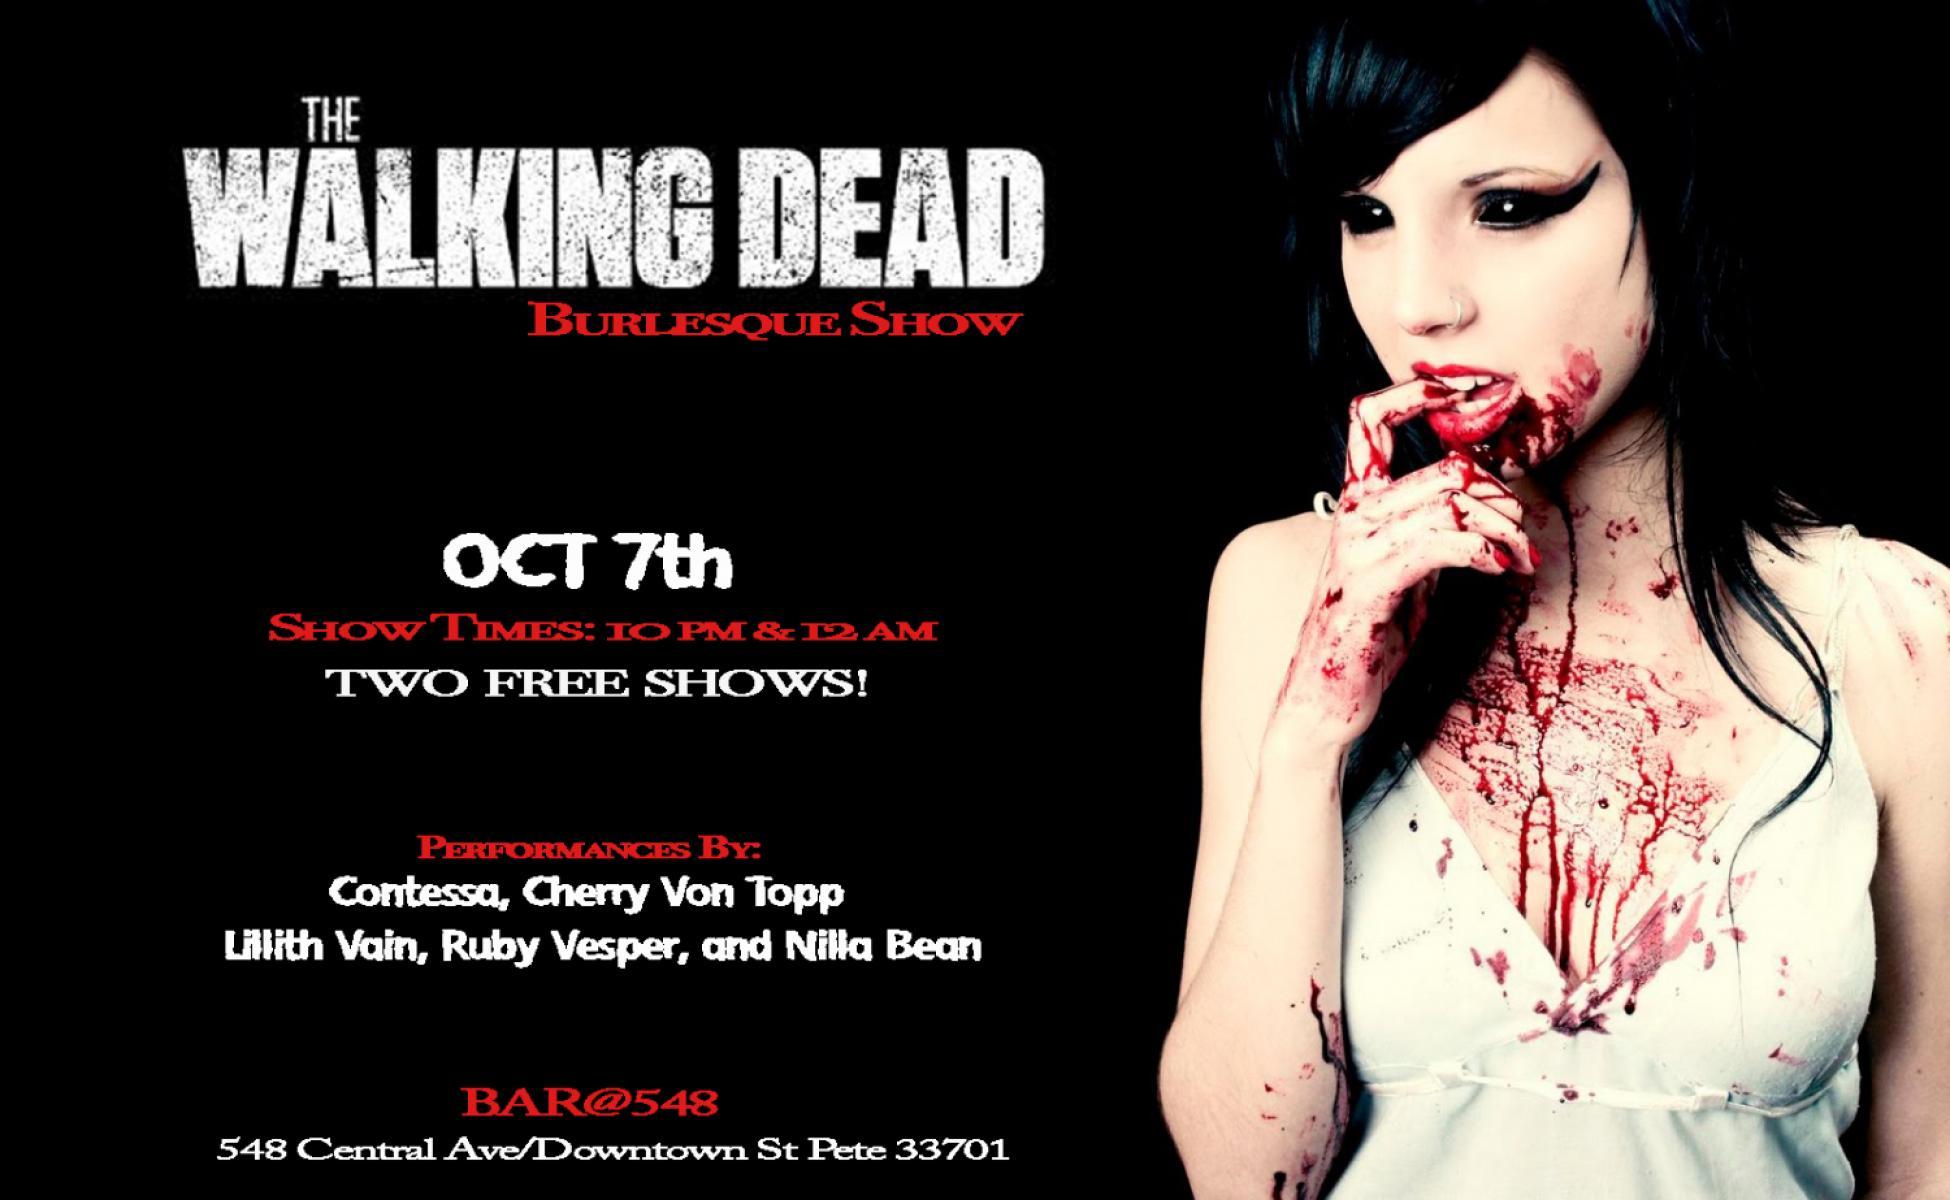 The Walking Dead Burlesque Show